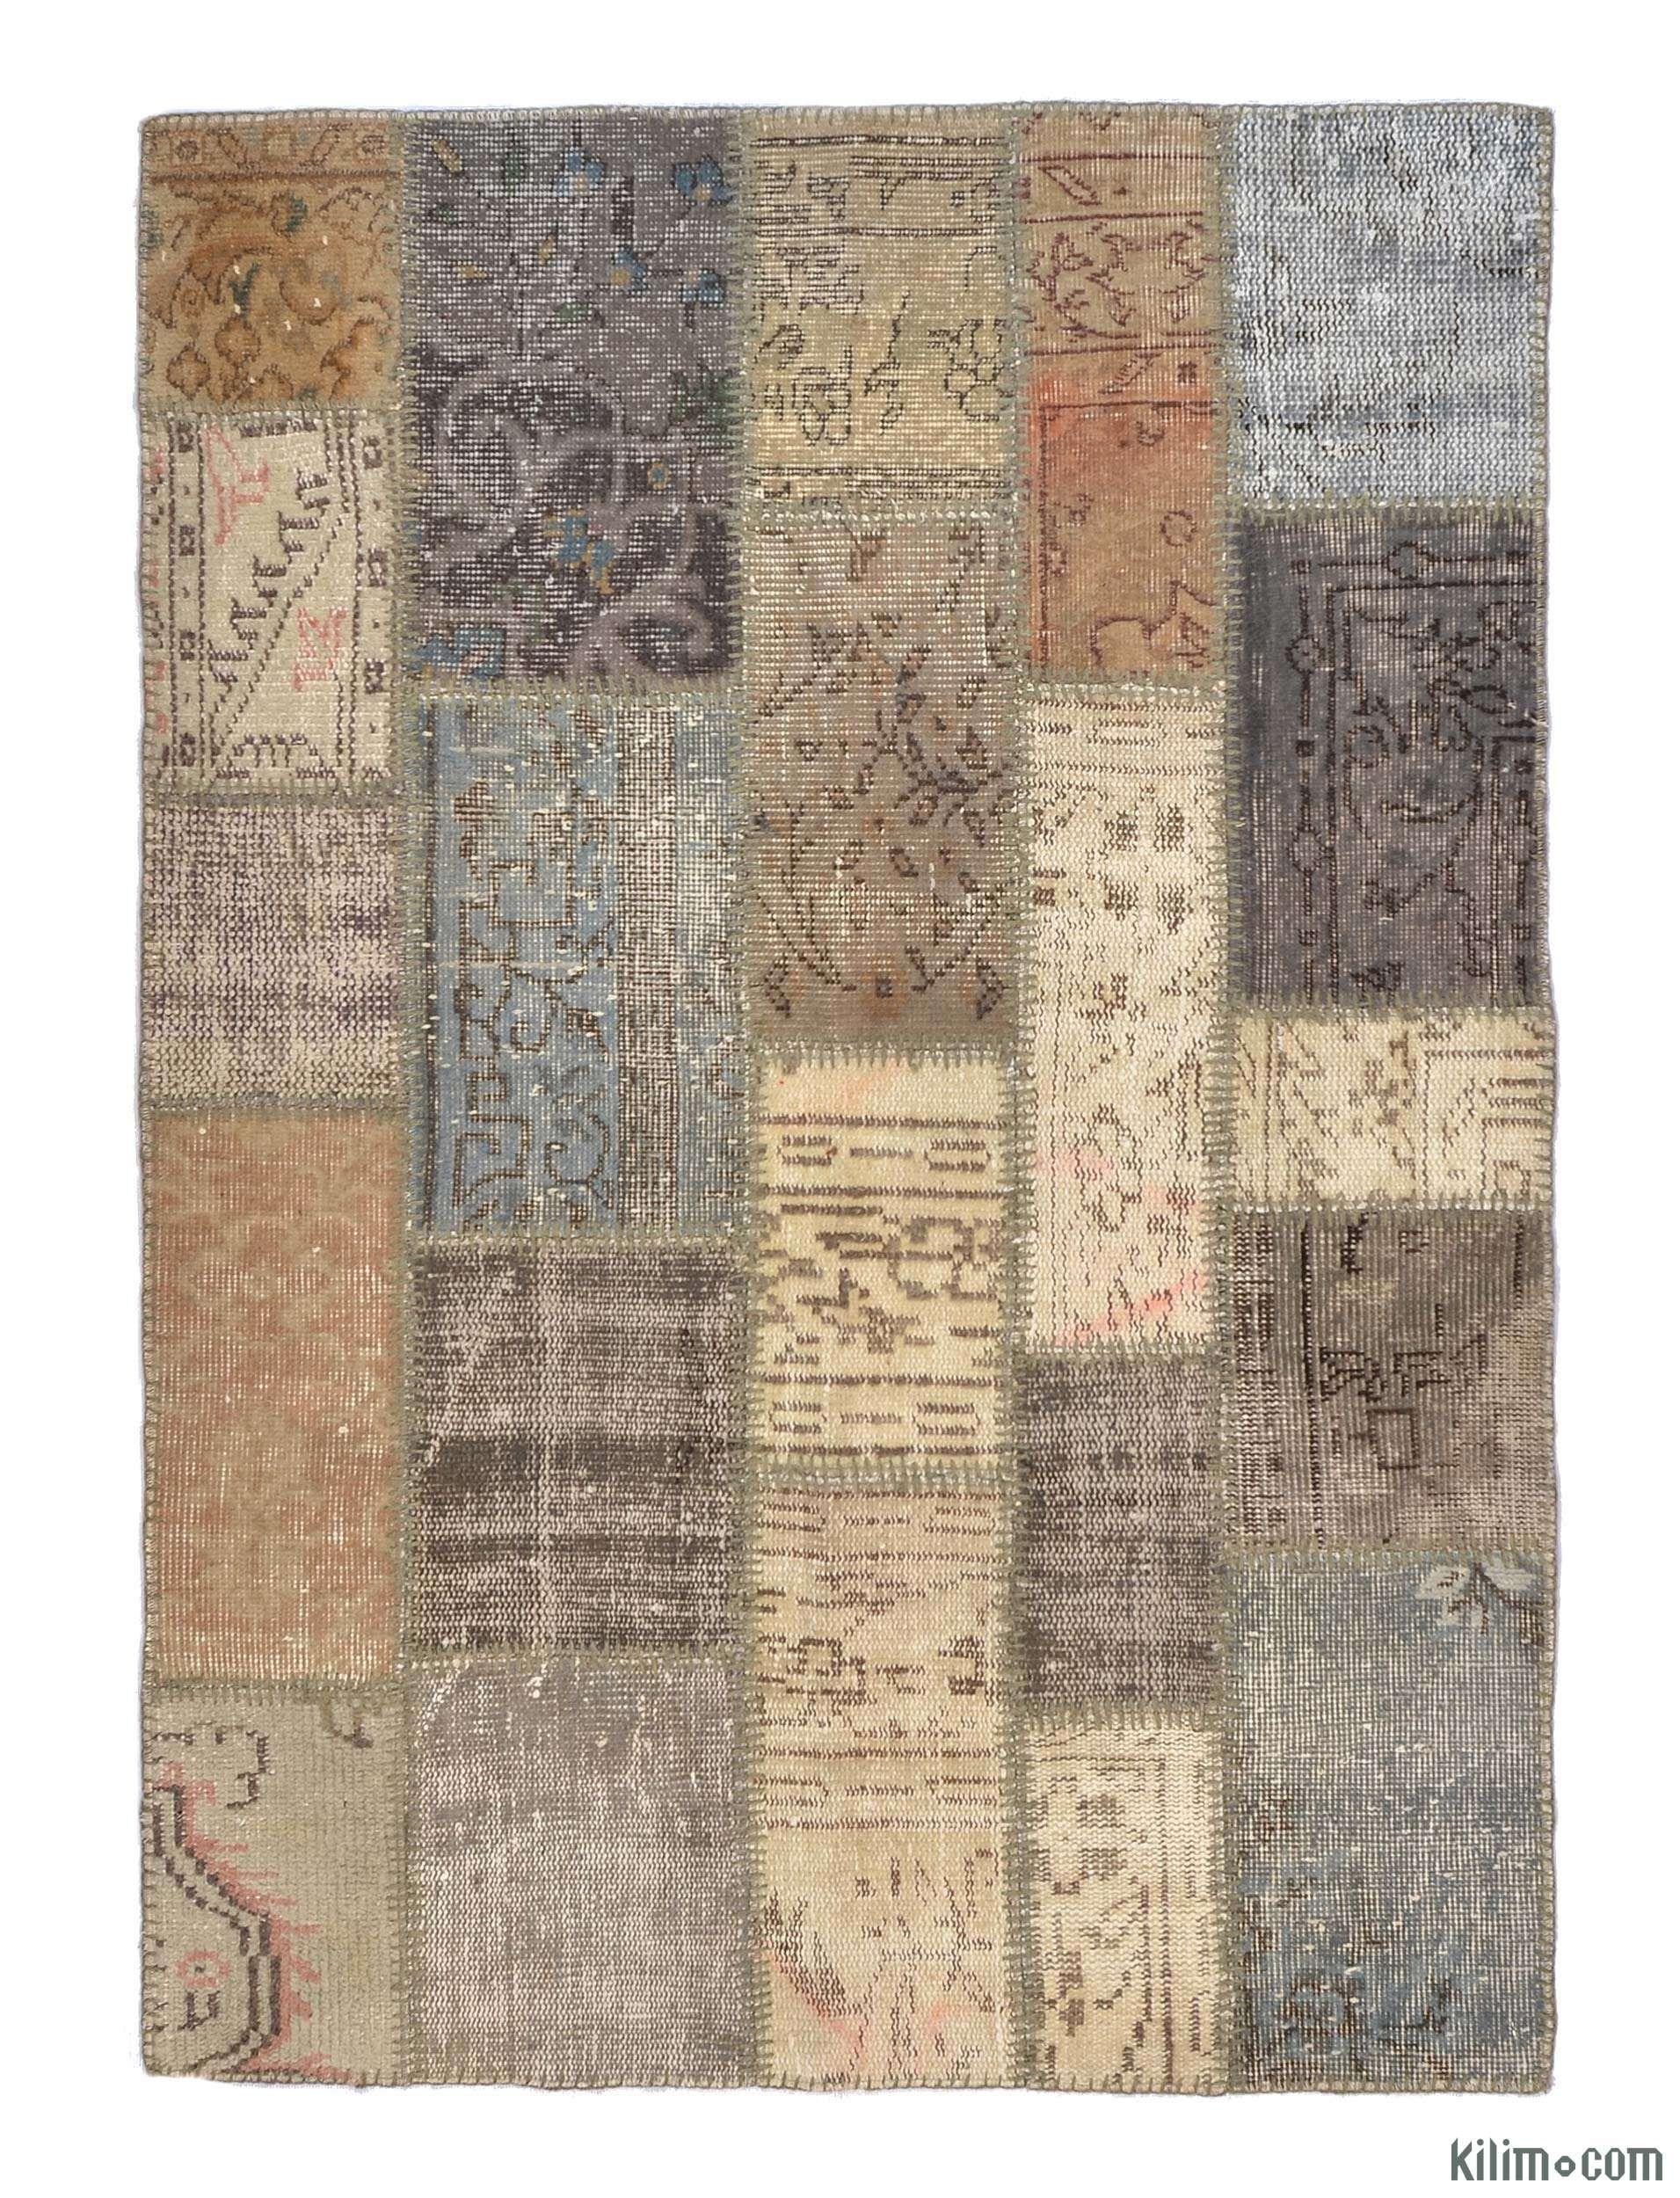 K0005373 Over Dyed Turkish Patchwork Rug Kilim Rugs Overdyed Vintage Hand